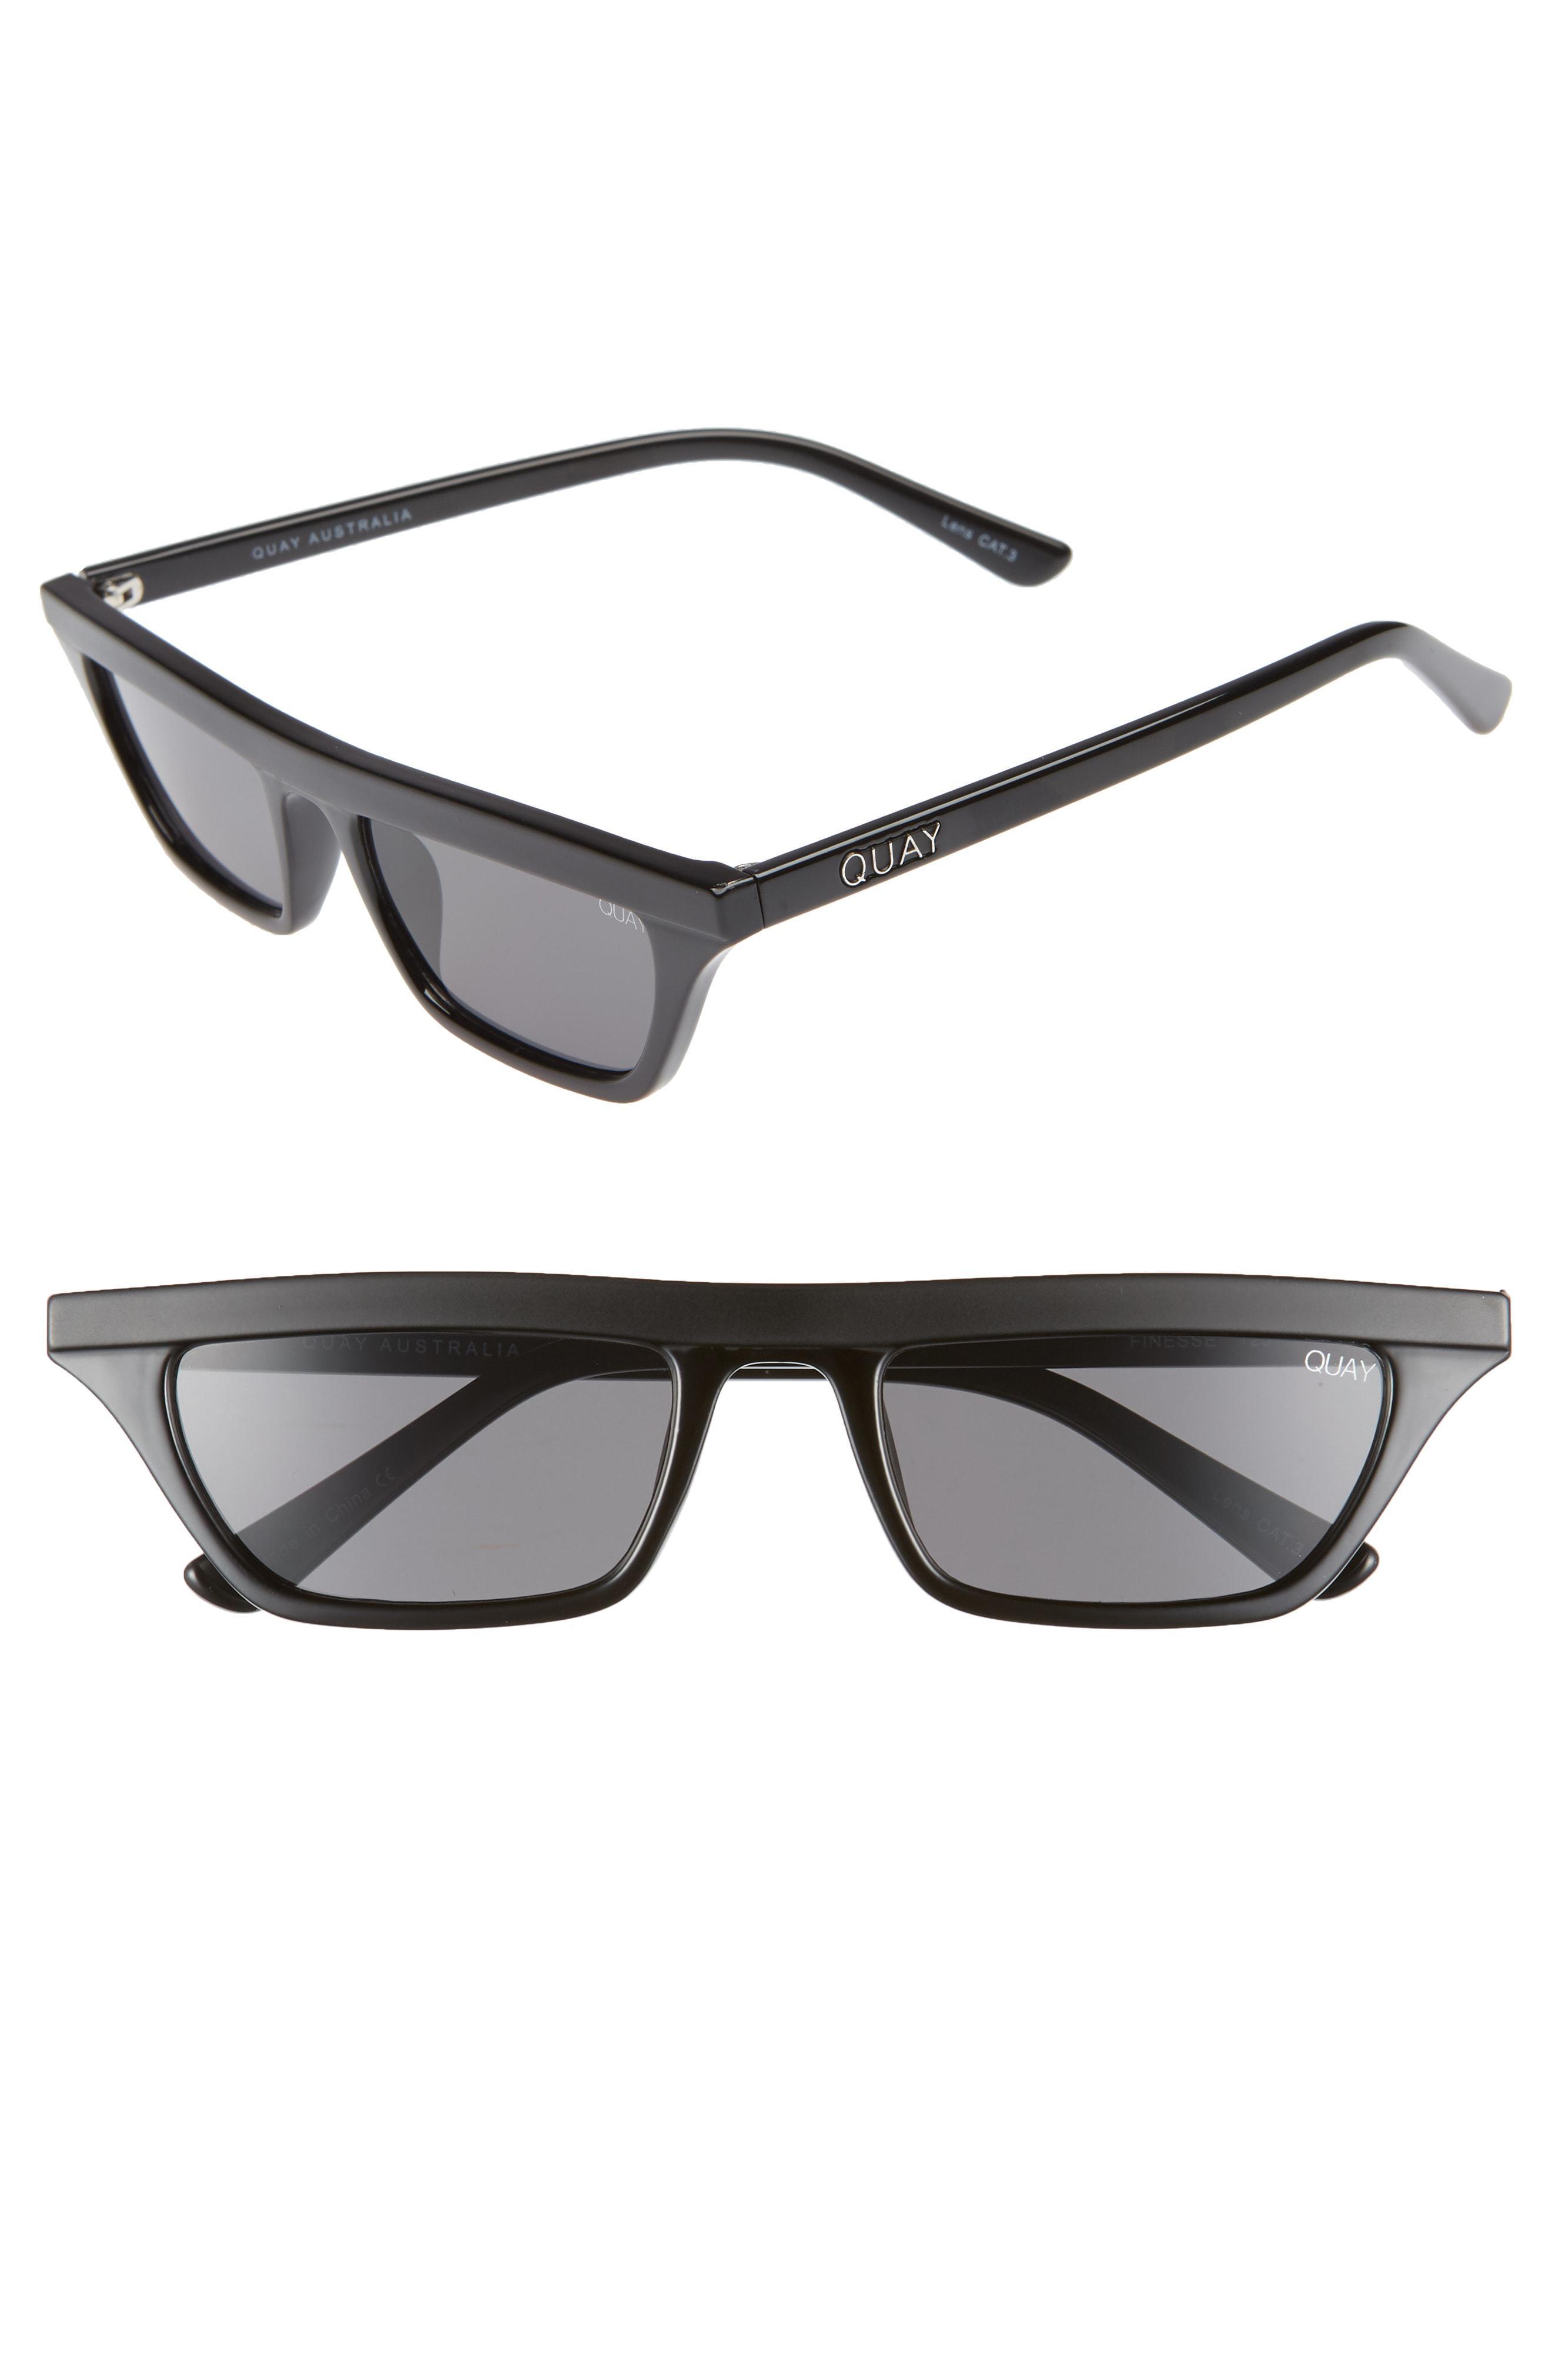 640ddedf5904b Quay Finesse 52mm Sunglasses - in Gray - Lyst